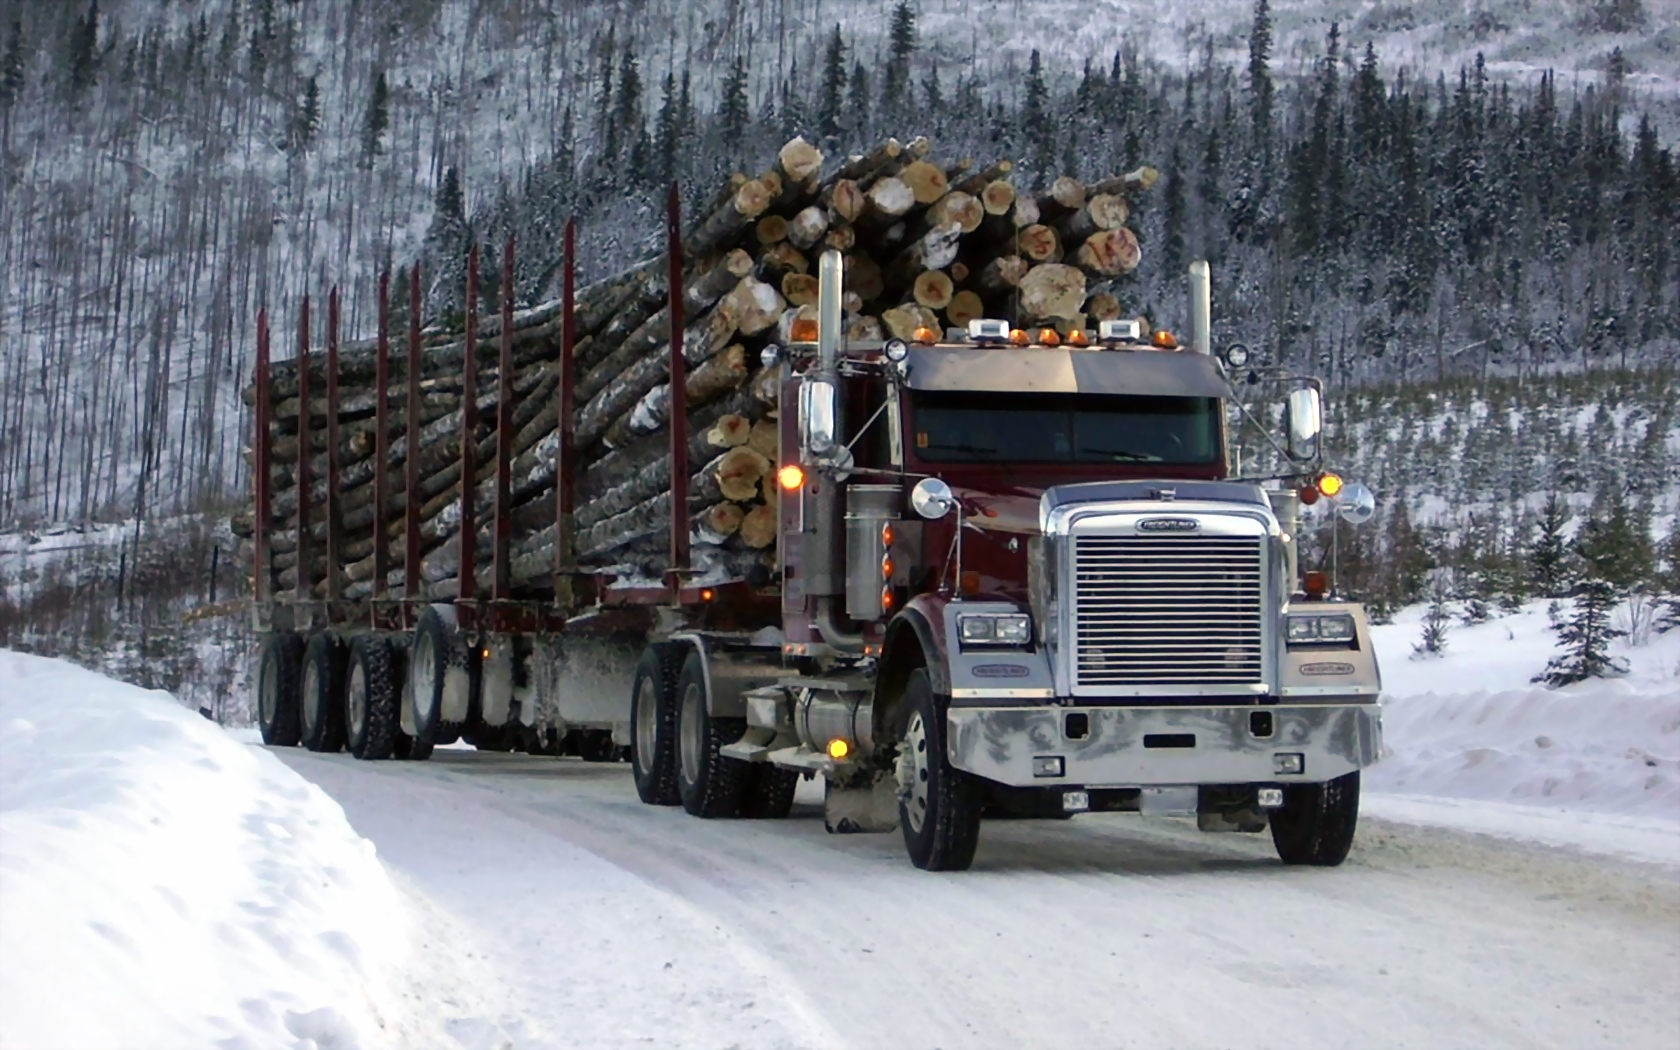 ... High quality Heavy Haulin' Freightliner Trucks wallpaper / 1680x1050